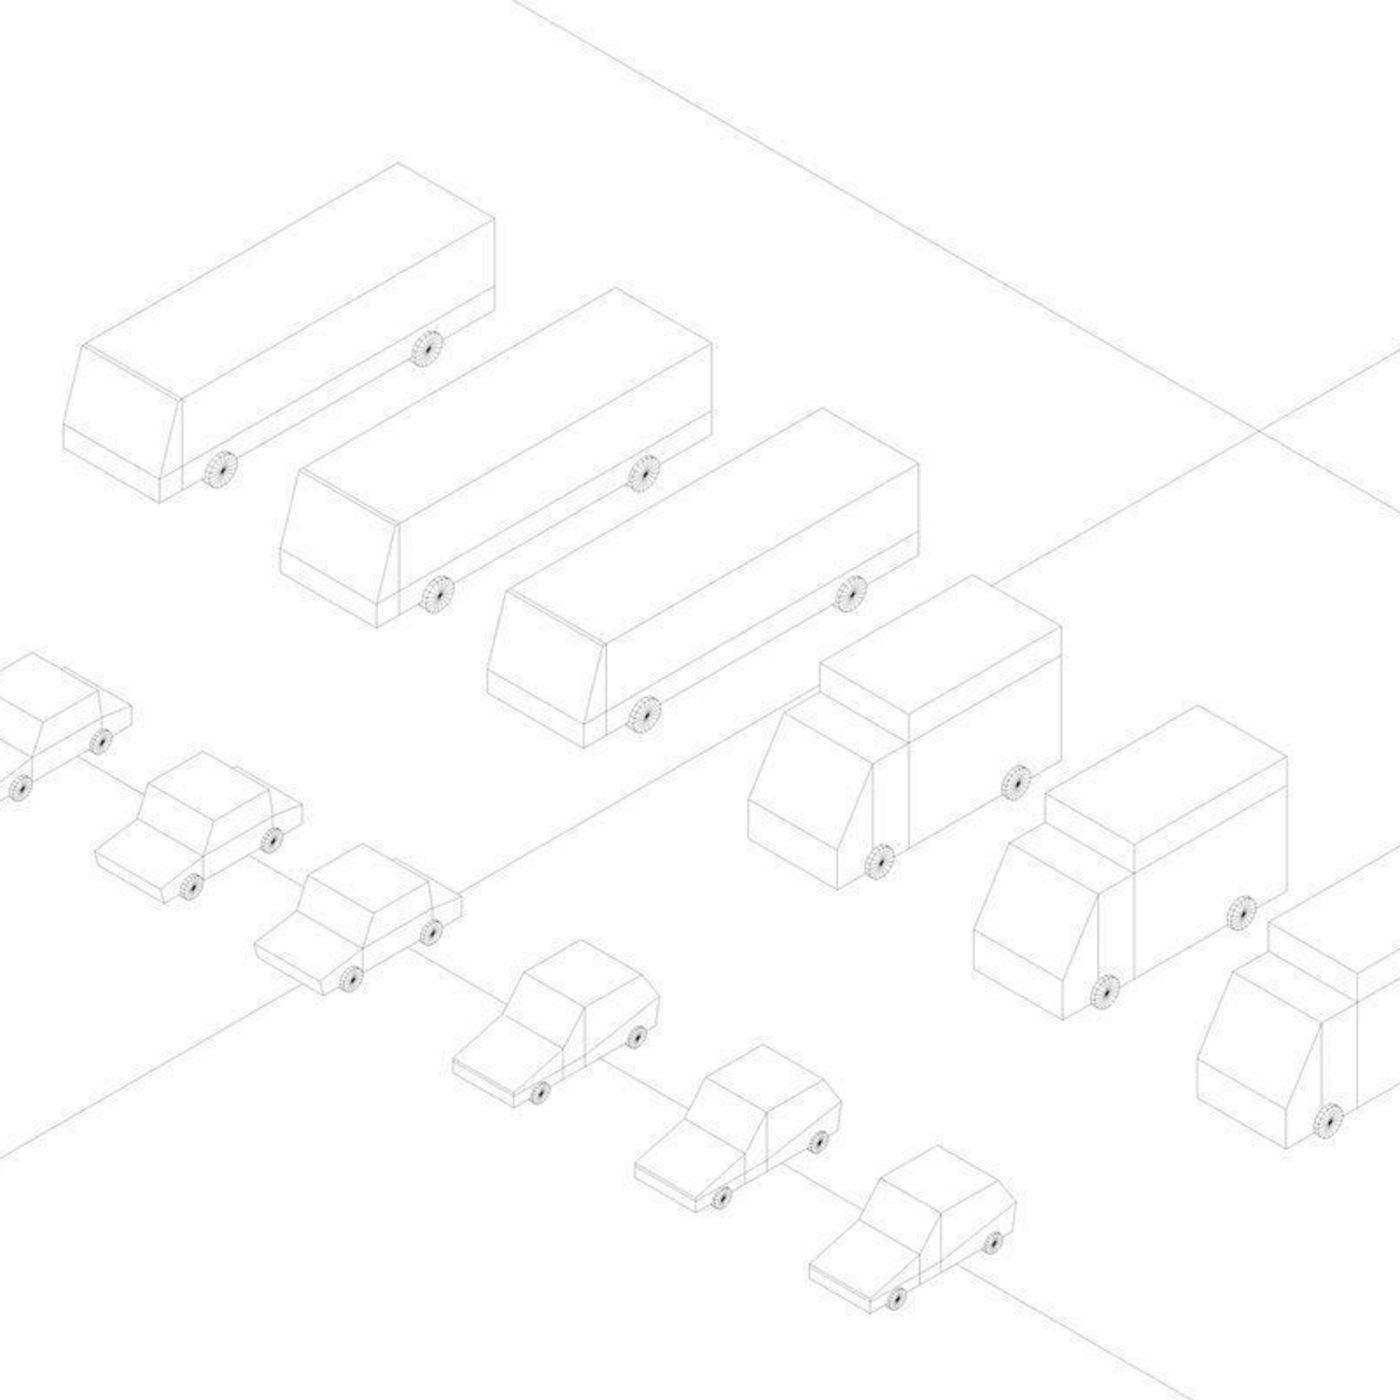 Cartoon Low Poly City Cars model